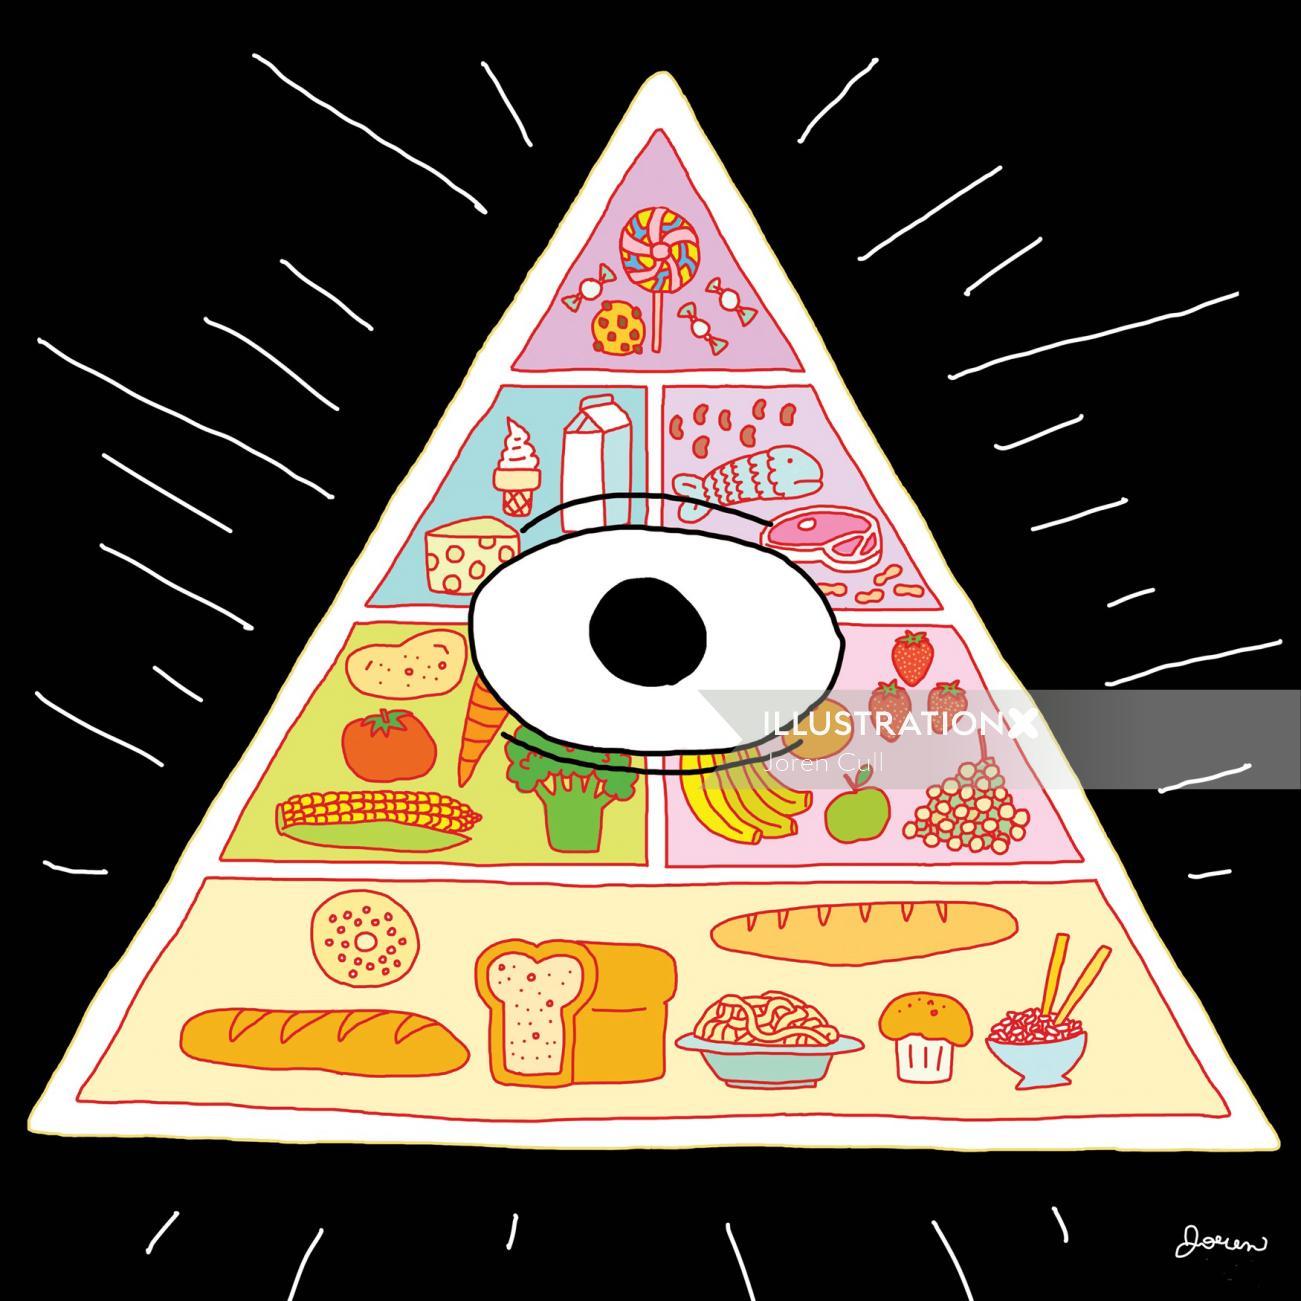 Infographic illustration of food